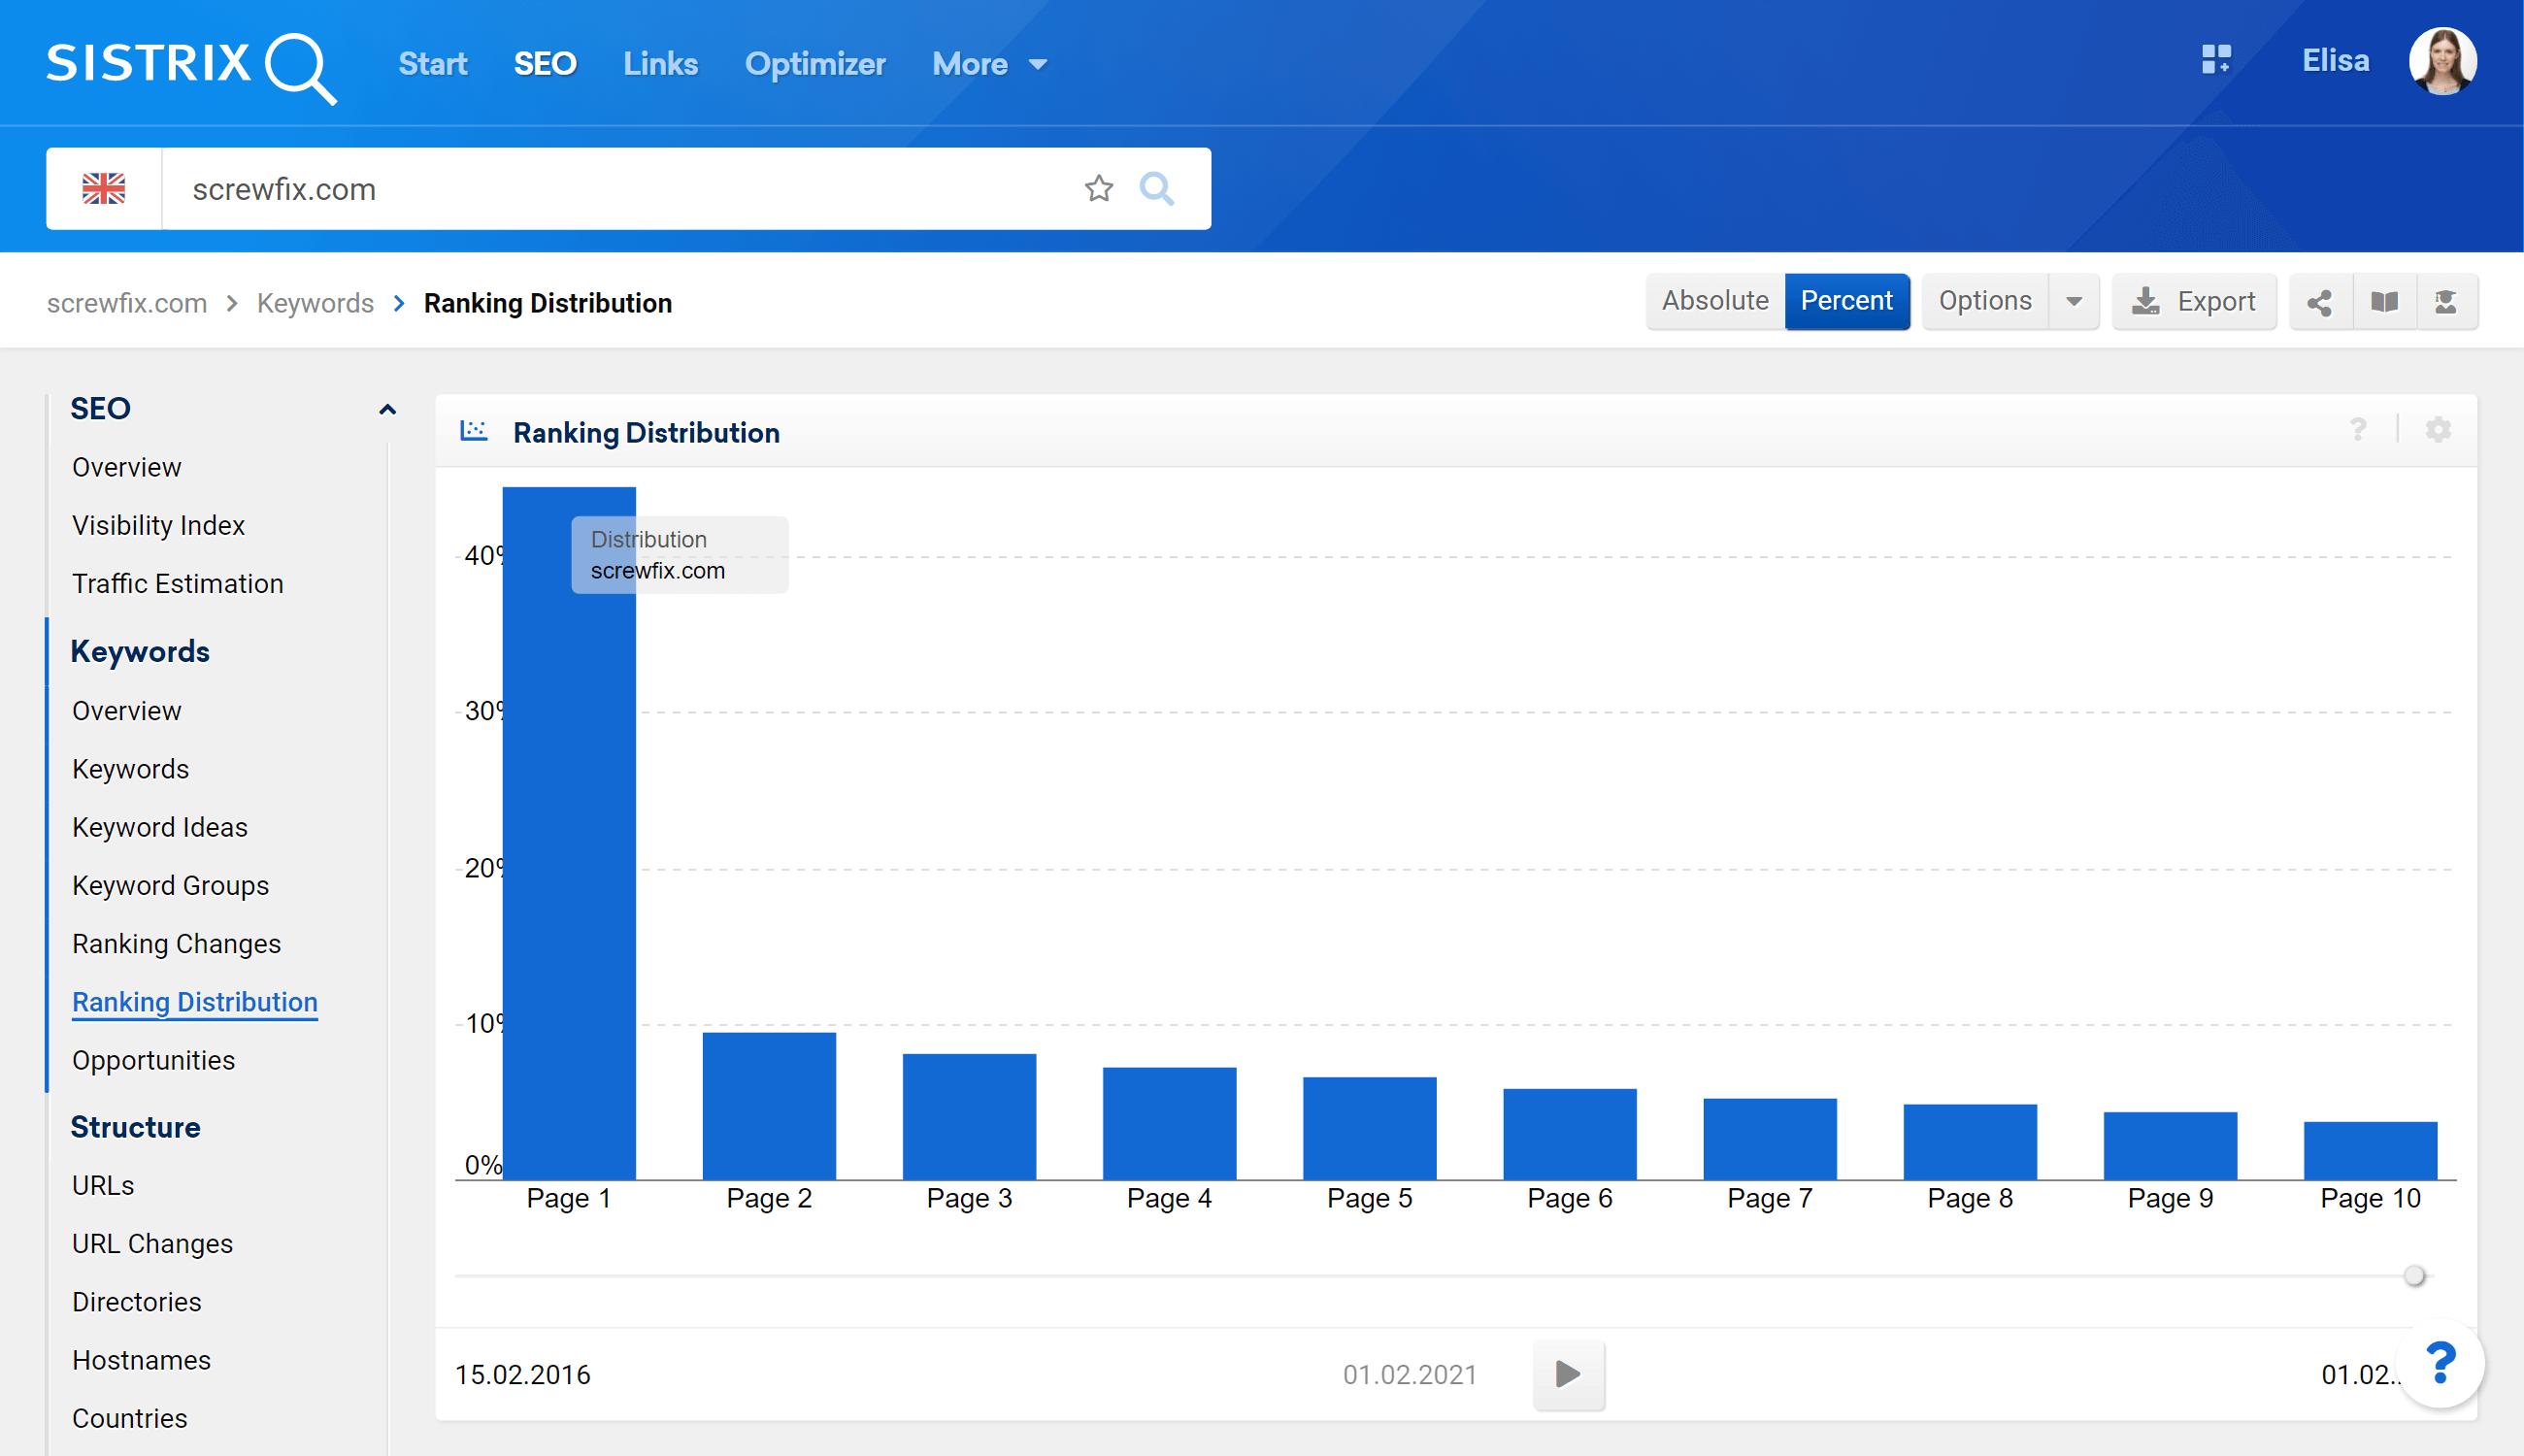 Ranking Distribution in SISTRIX